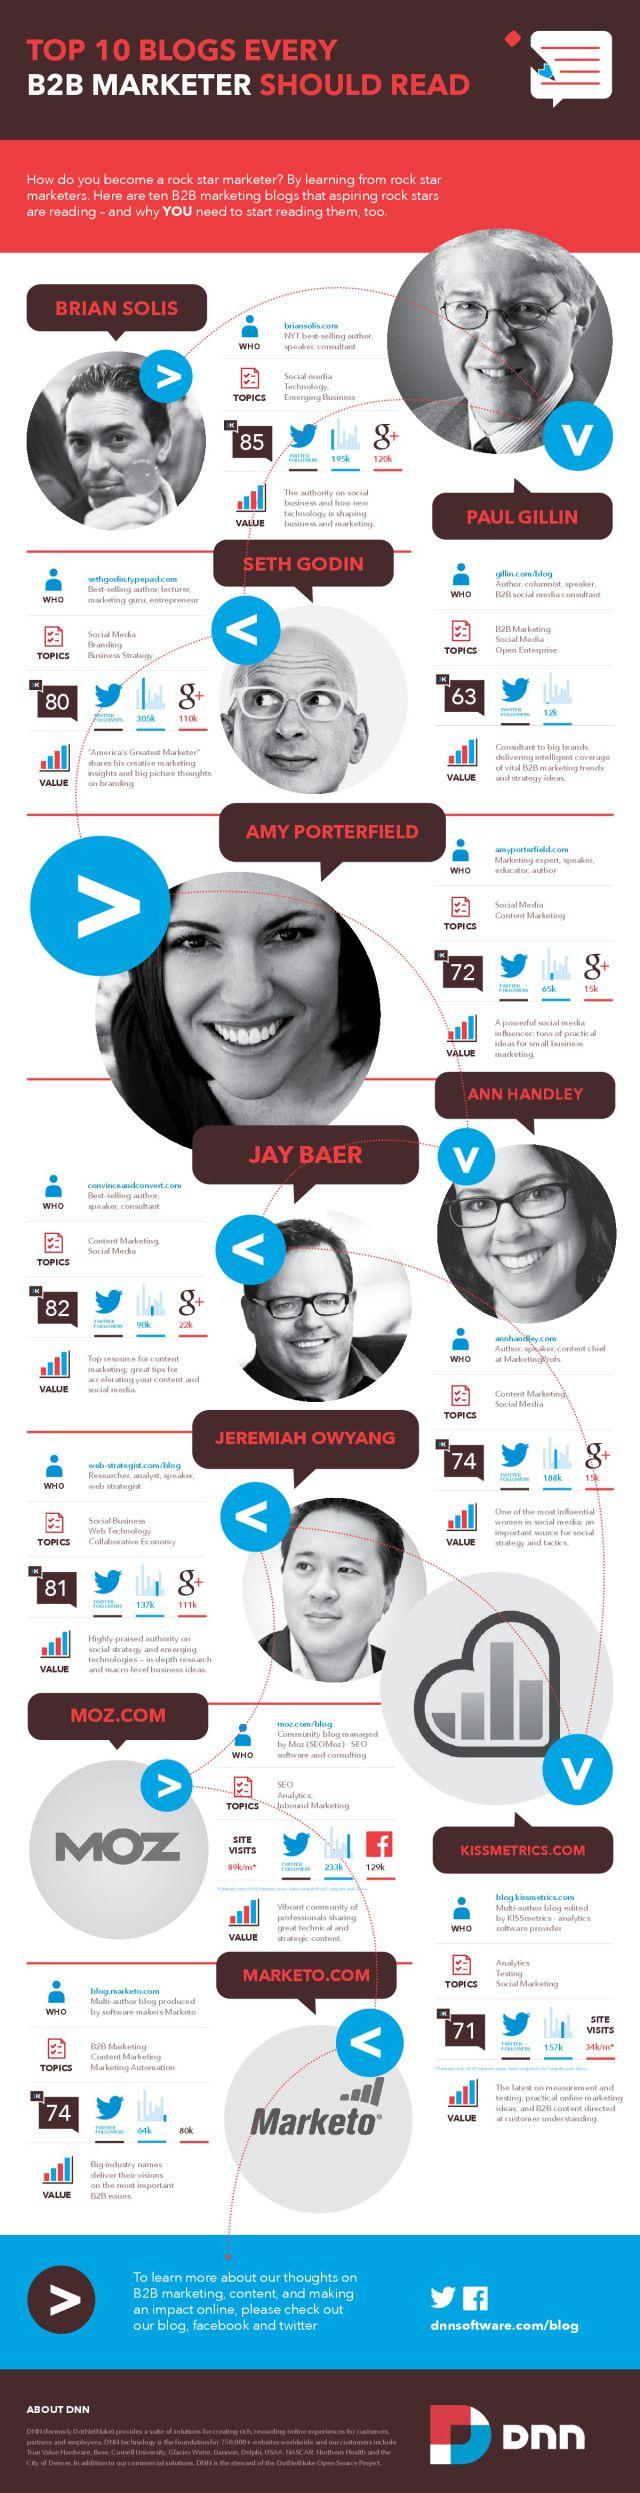 Top 10 blogs every B2B Marketer should read #infografia #infographic #socialmedia